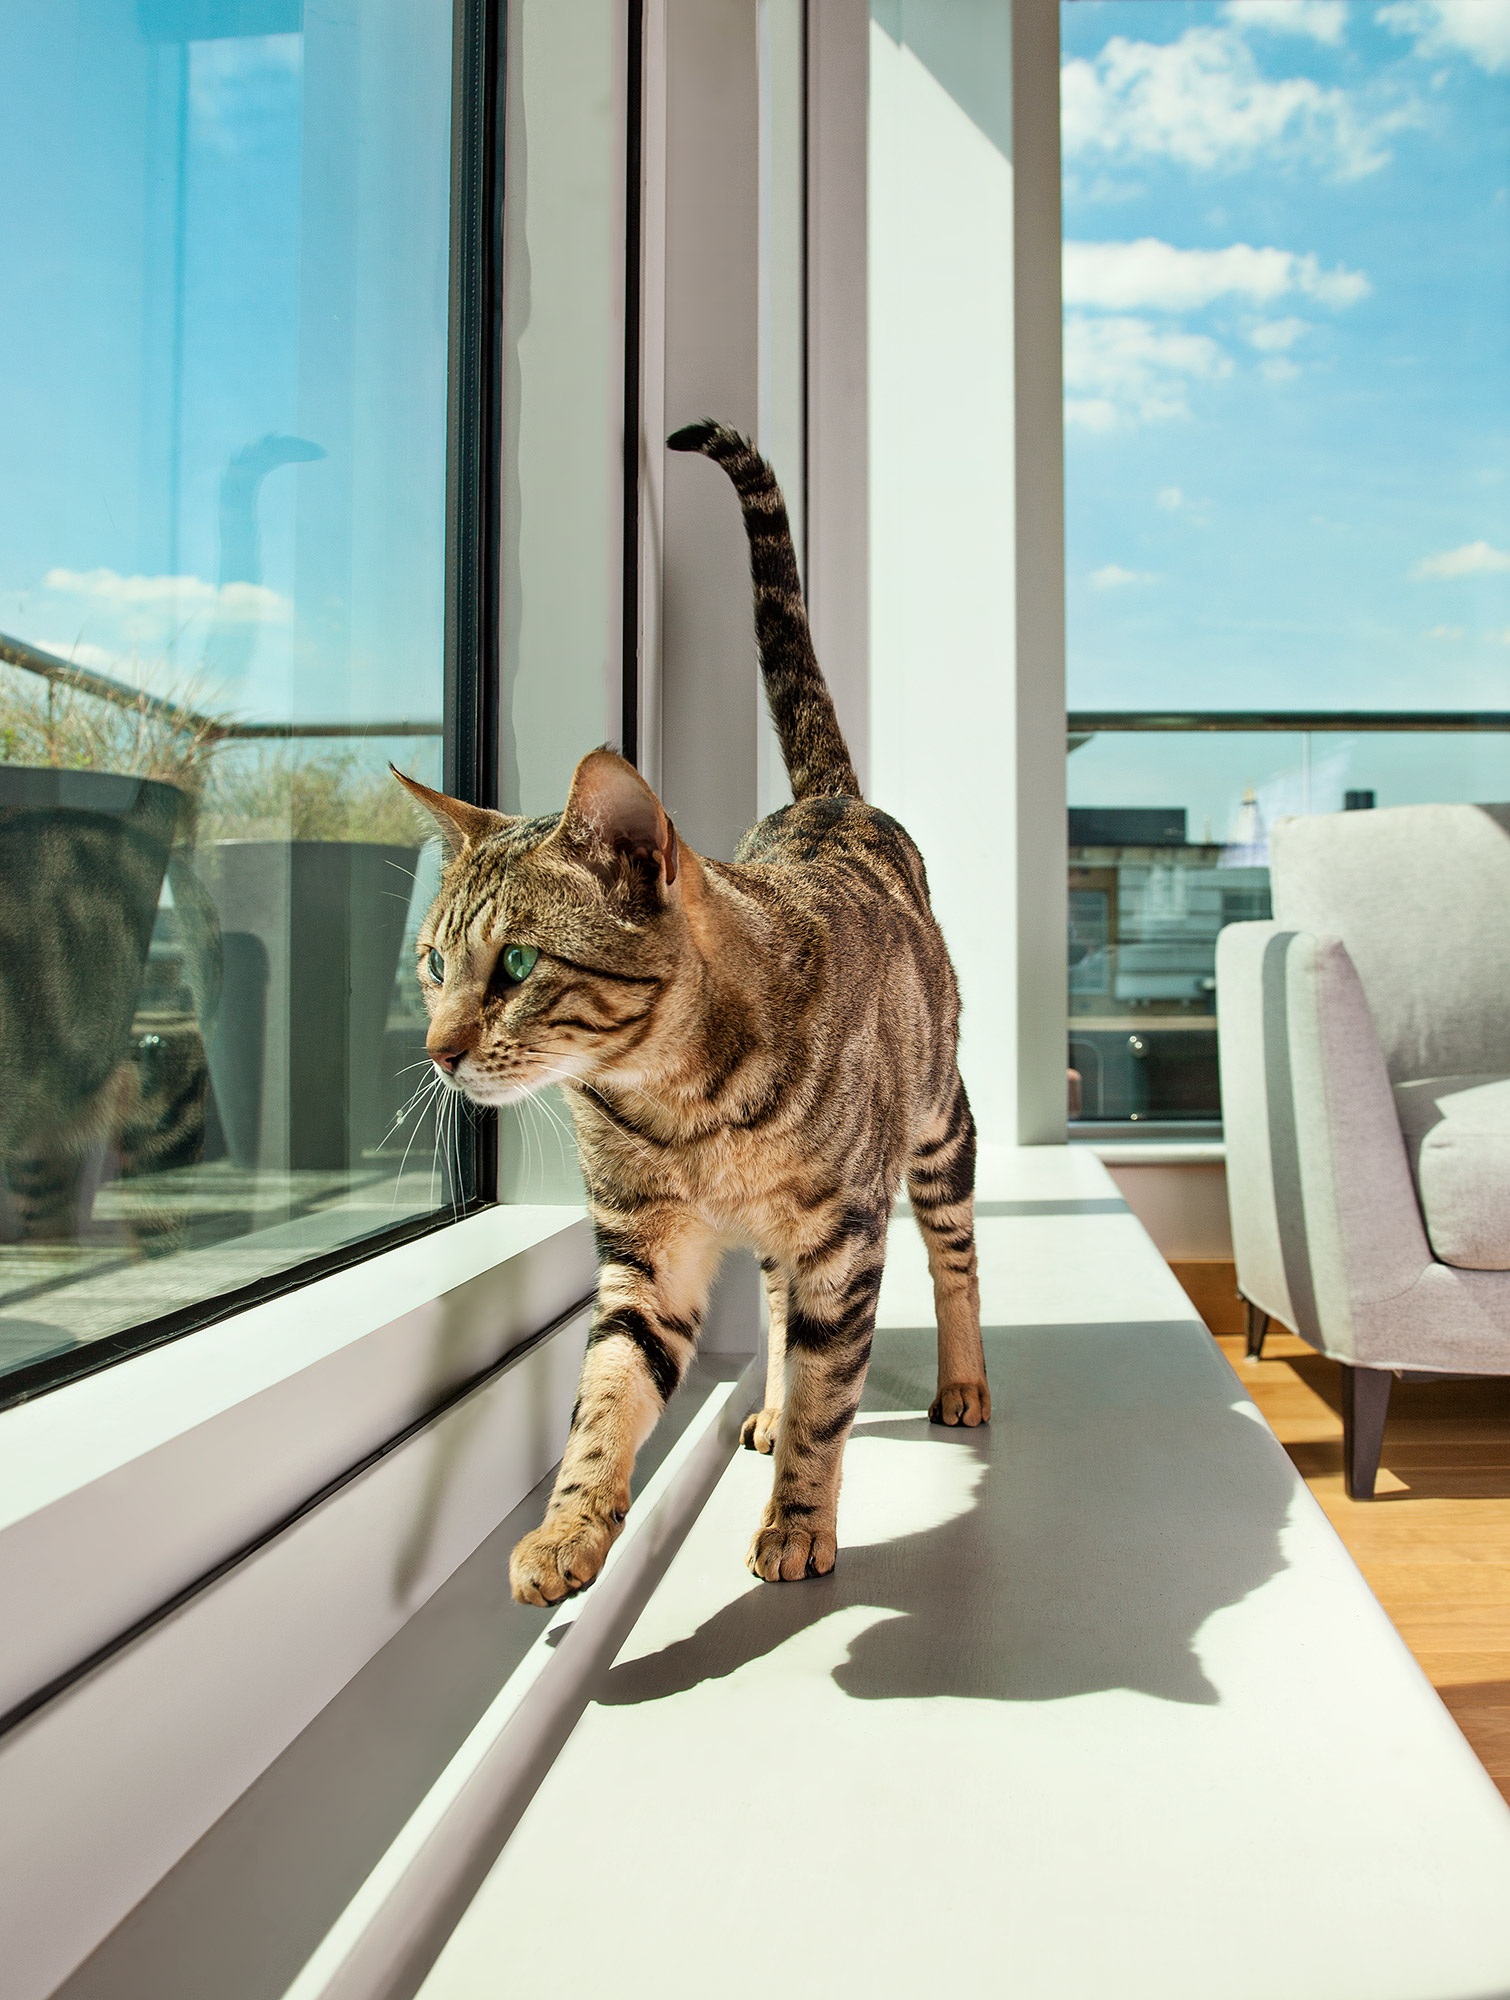 Cat in window animal photo